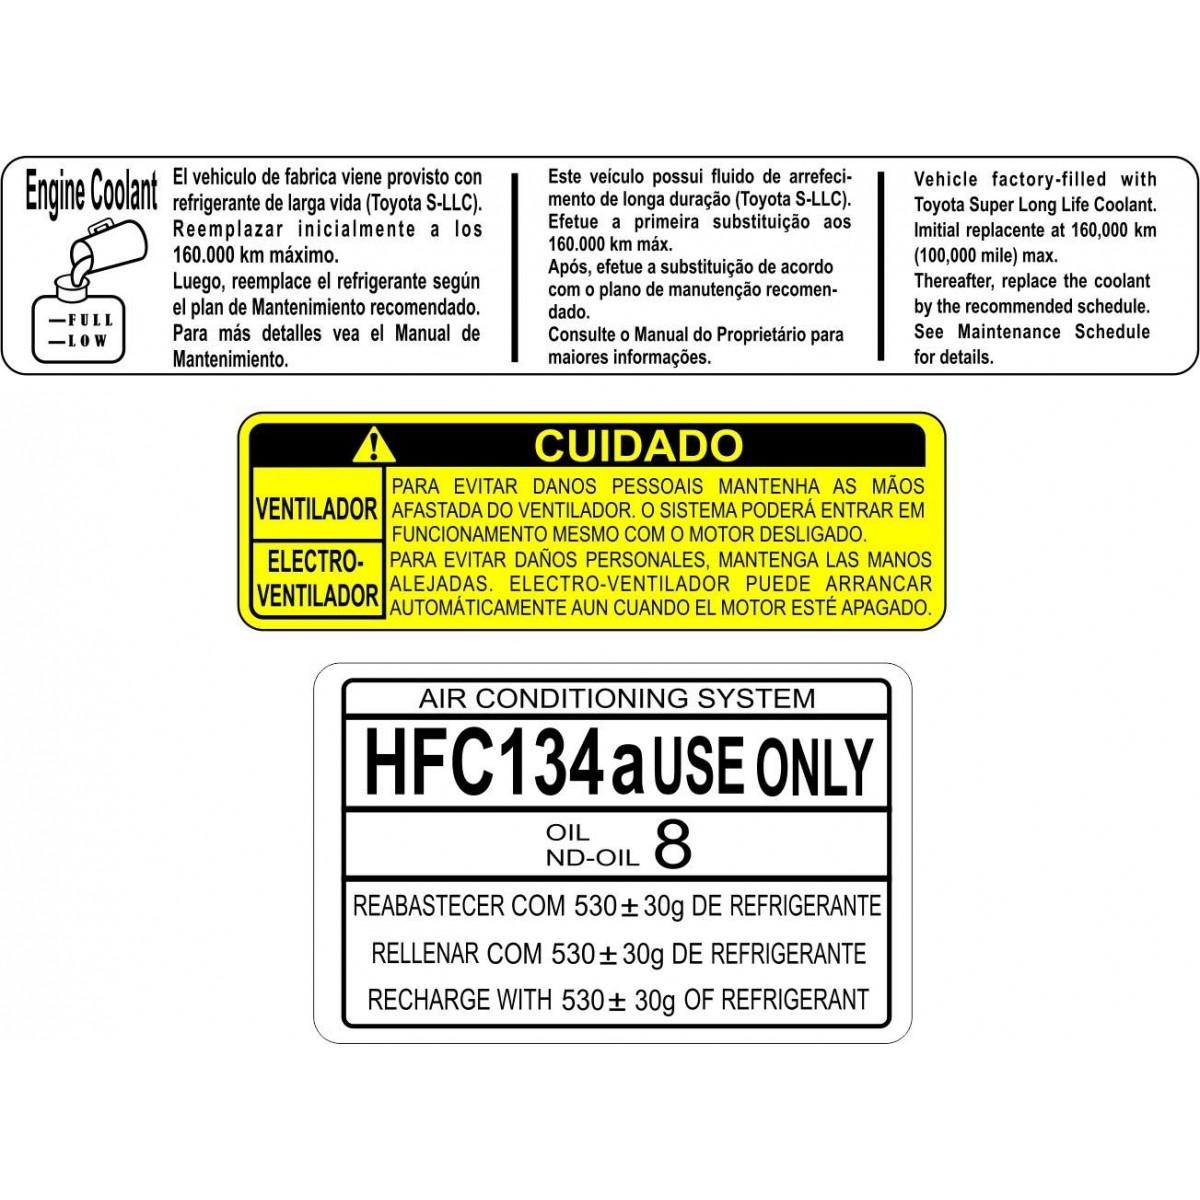 Kit Adesivos Etiquetas Motor Toyota Corolla - Decalx